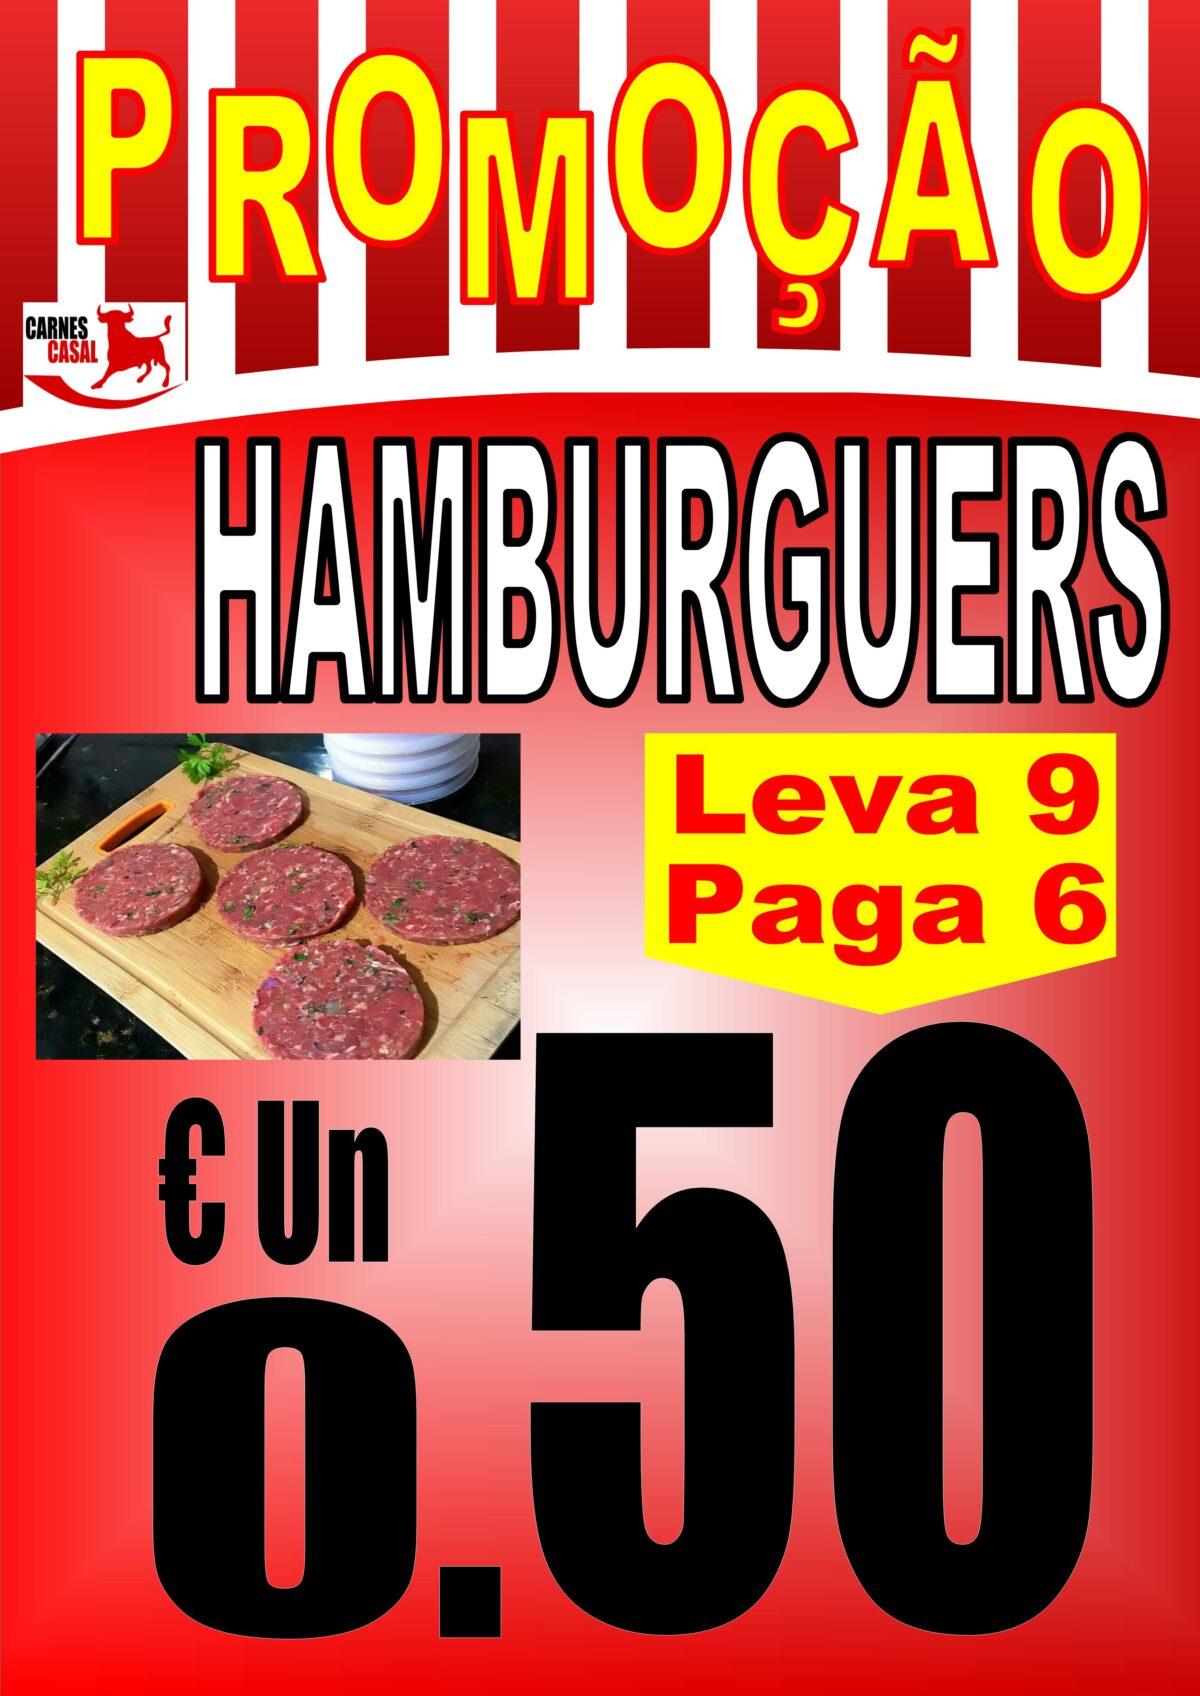 hamburguers